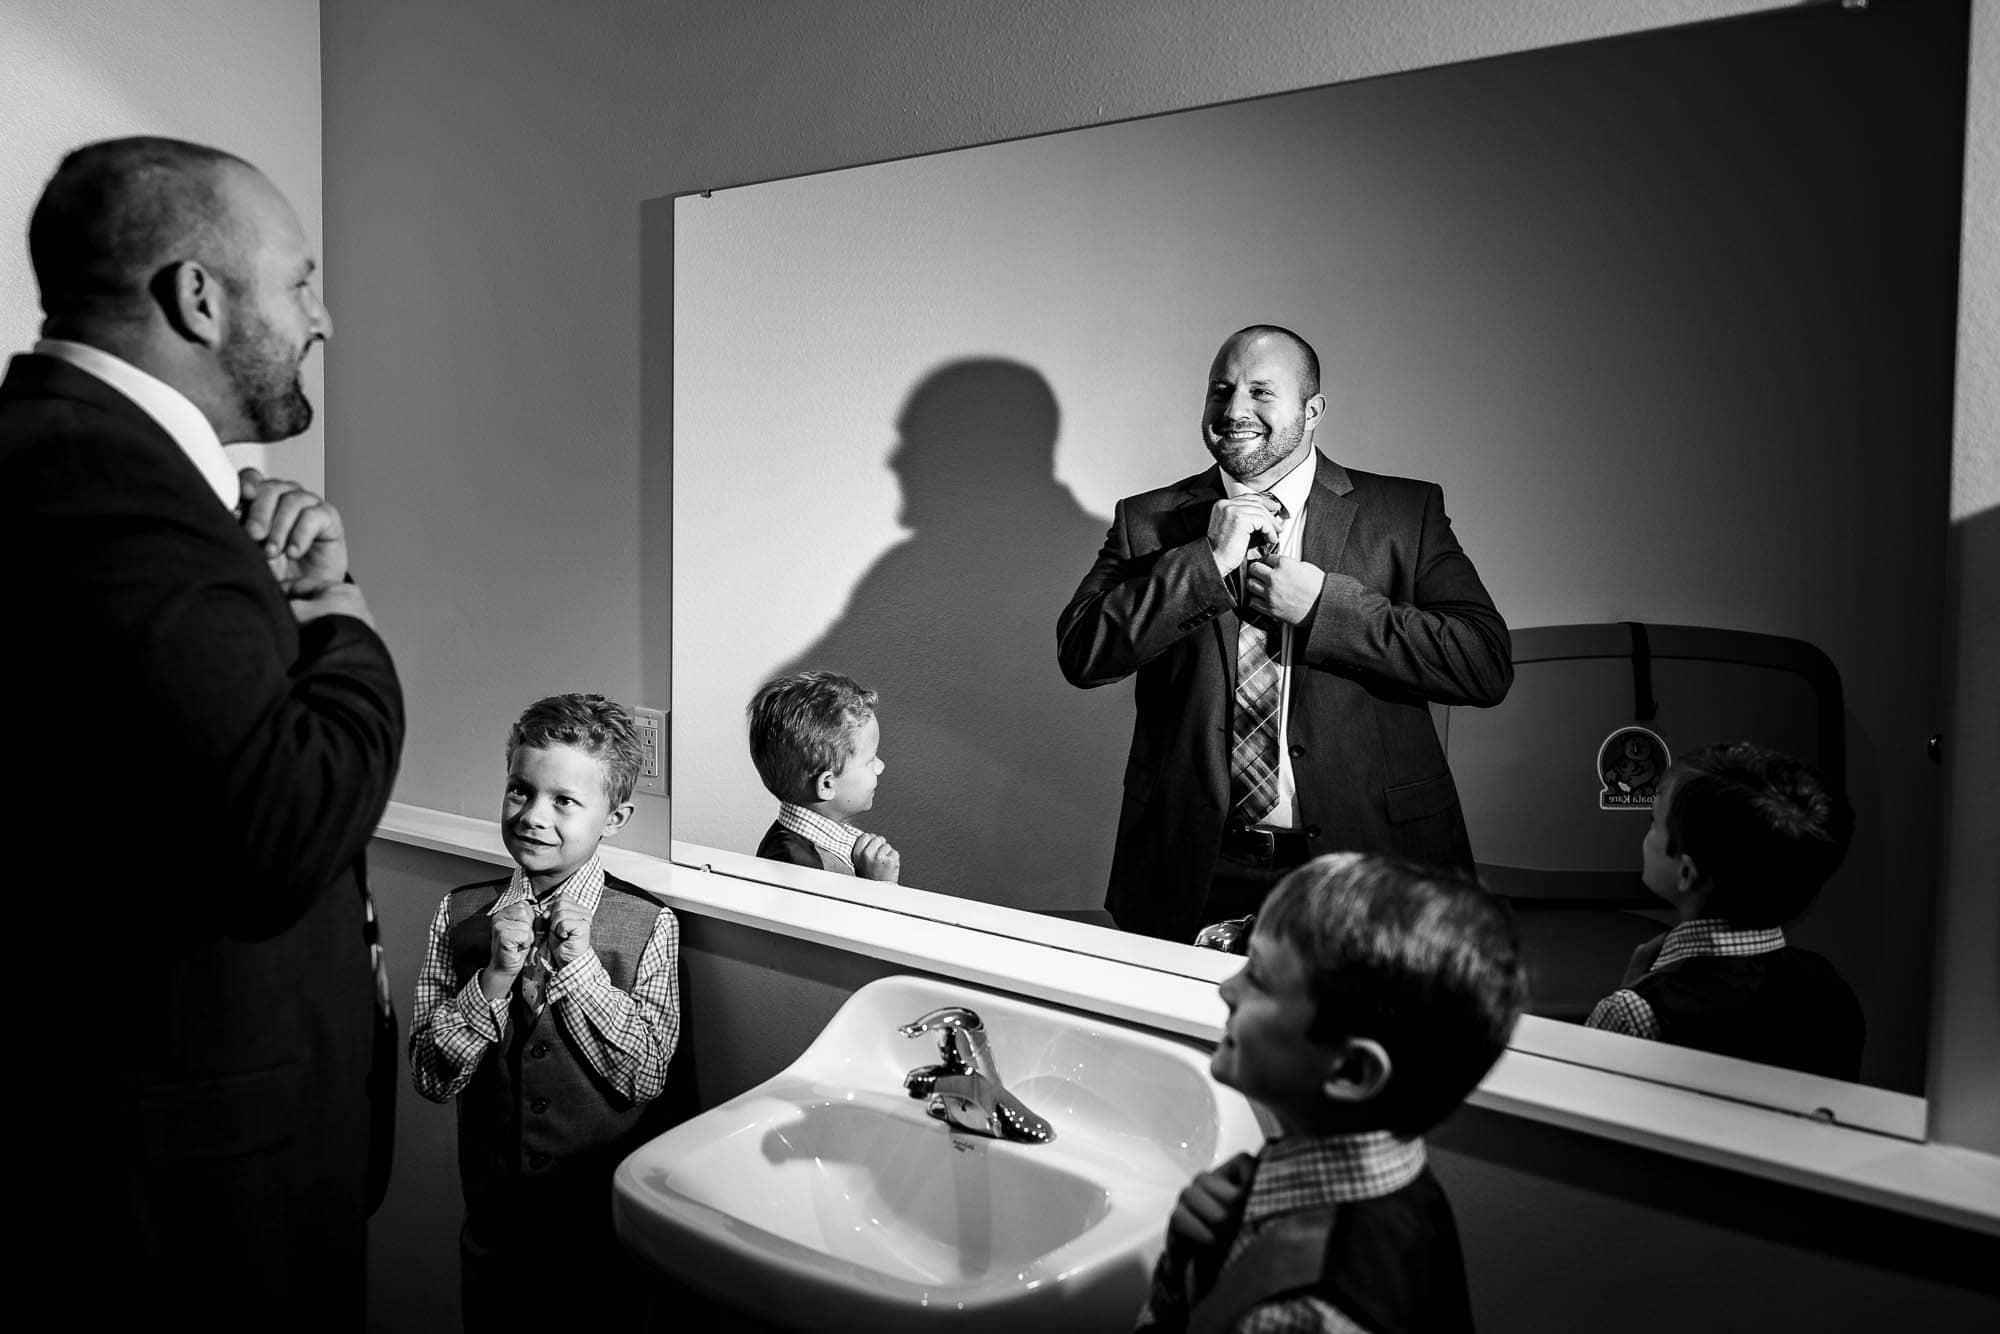 Tie a tie by La Crosse, WI Photographer Jeff Wiswell